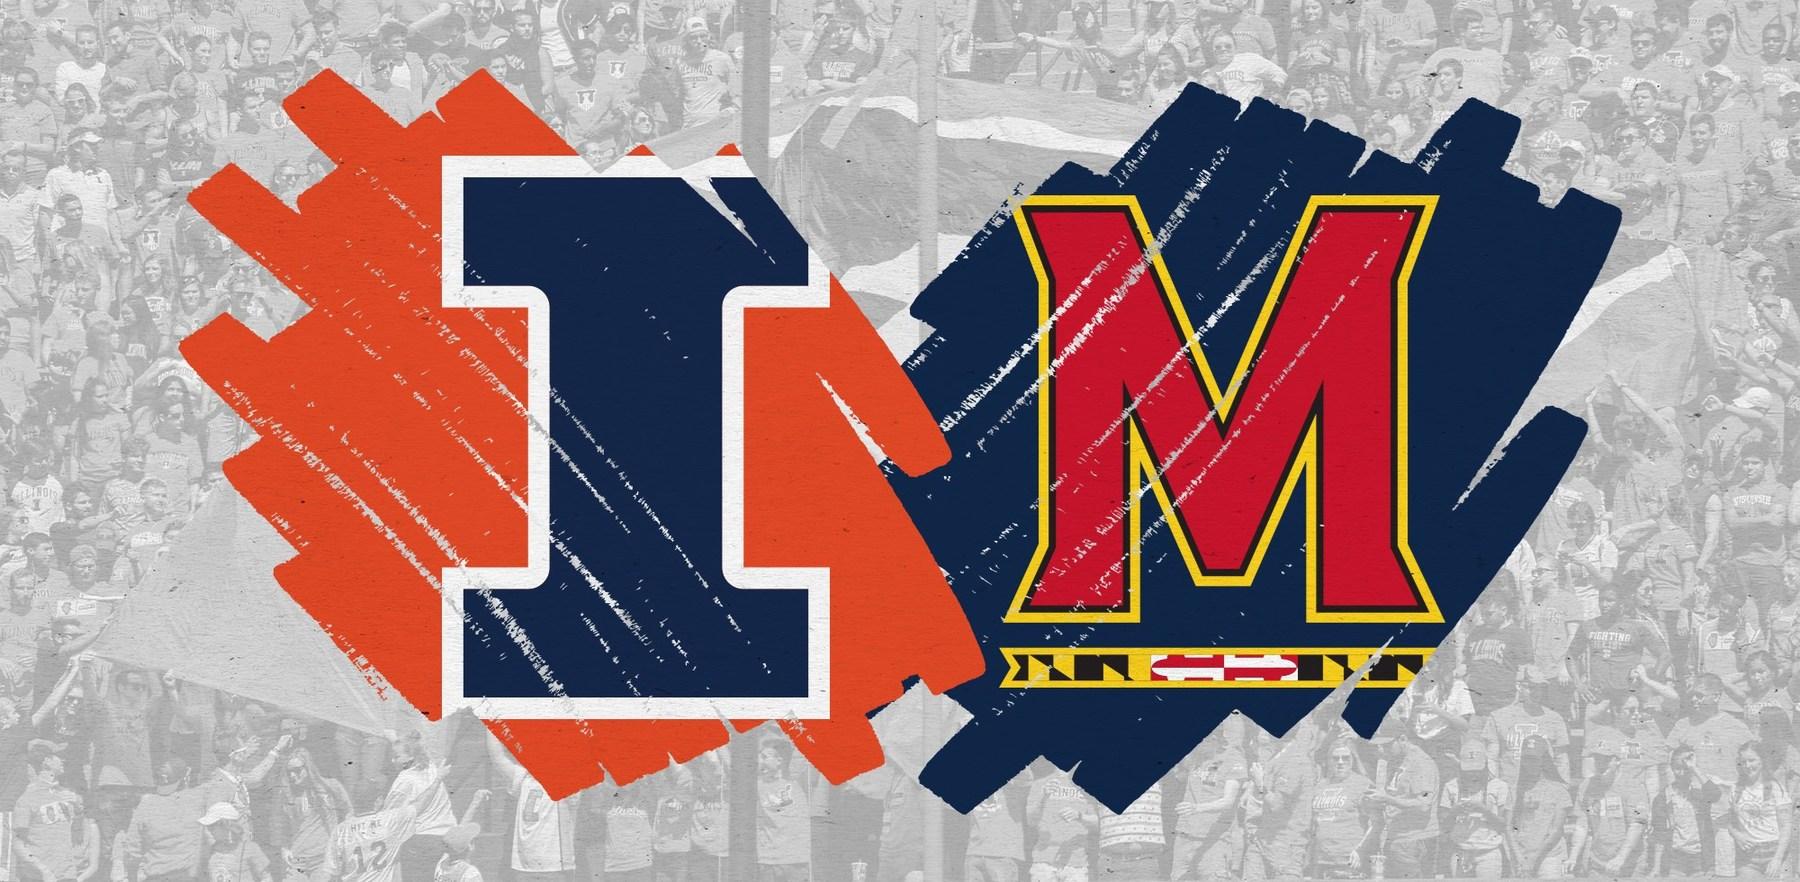 graphic using the Illinois and Maryland athletics logos